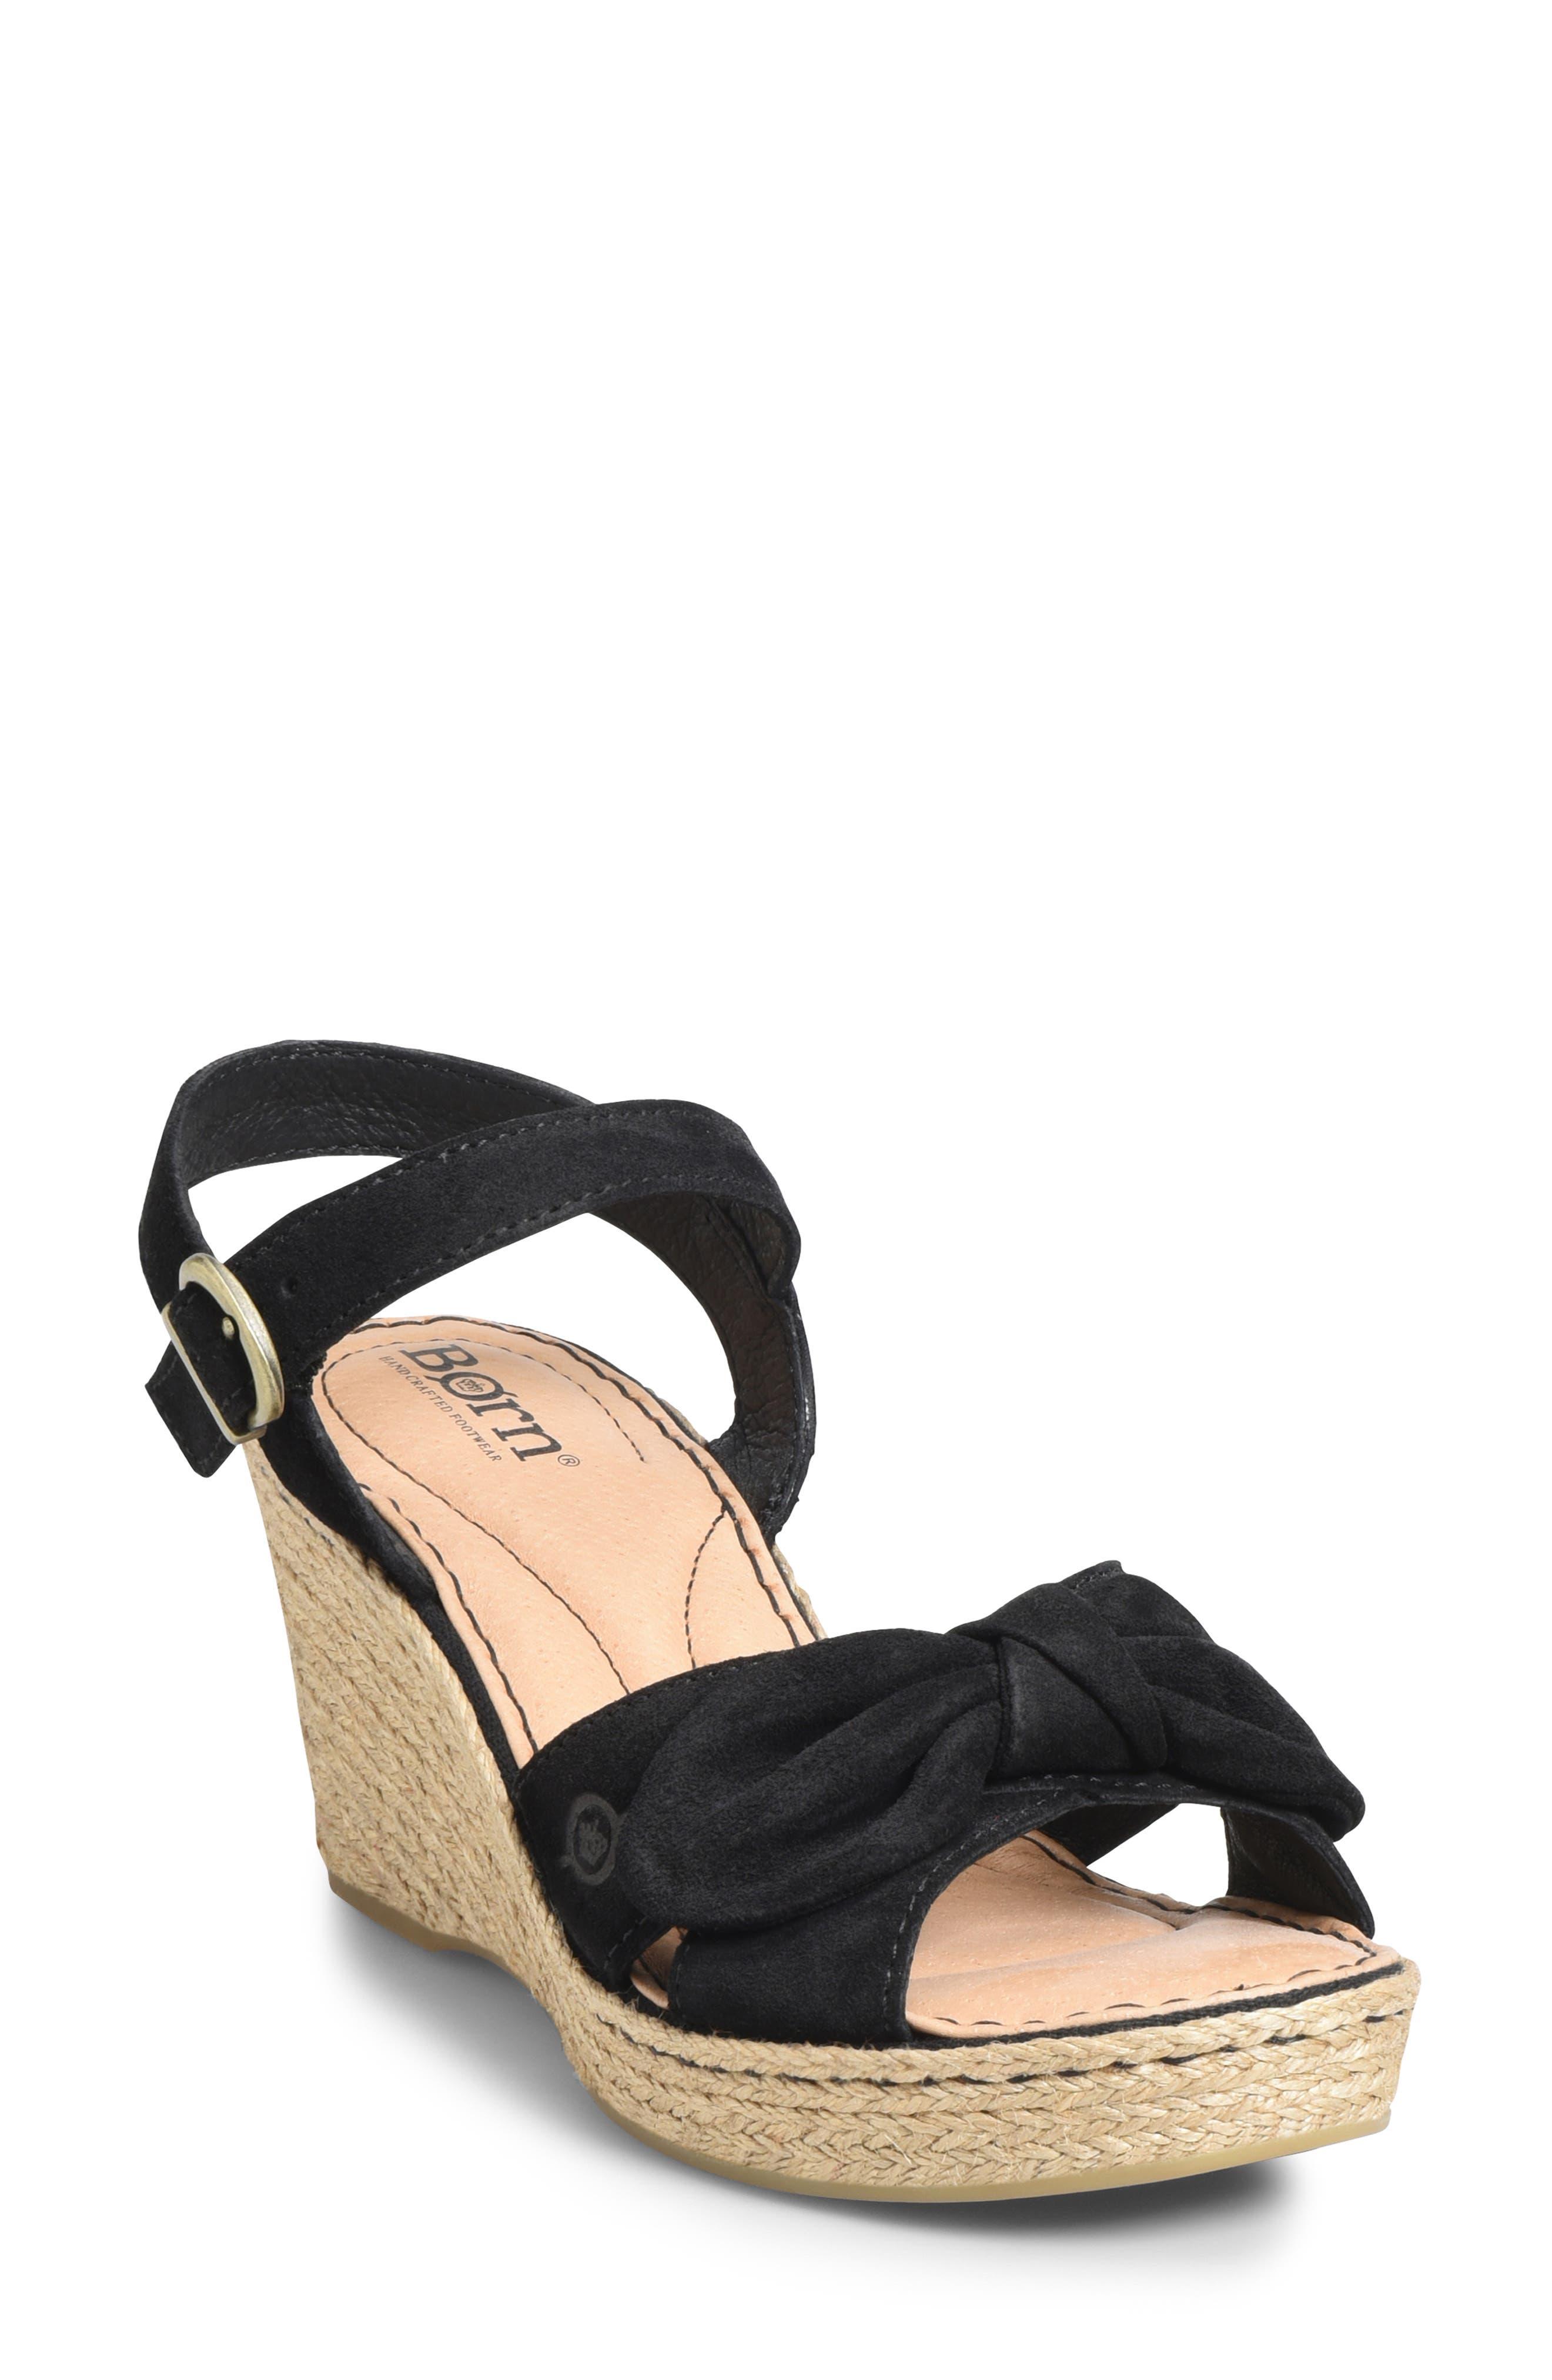 BØRN Monticello Knotted Wedge Sandal, Main, color, BLACK SUEDE